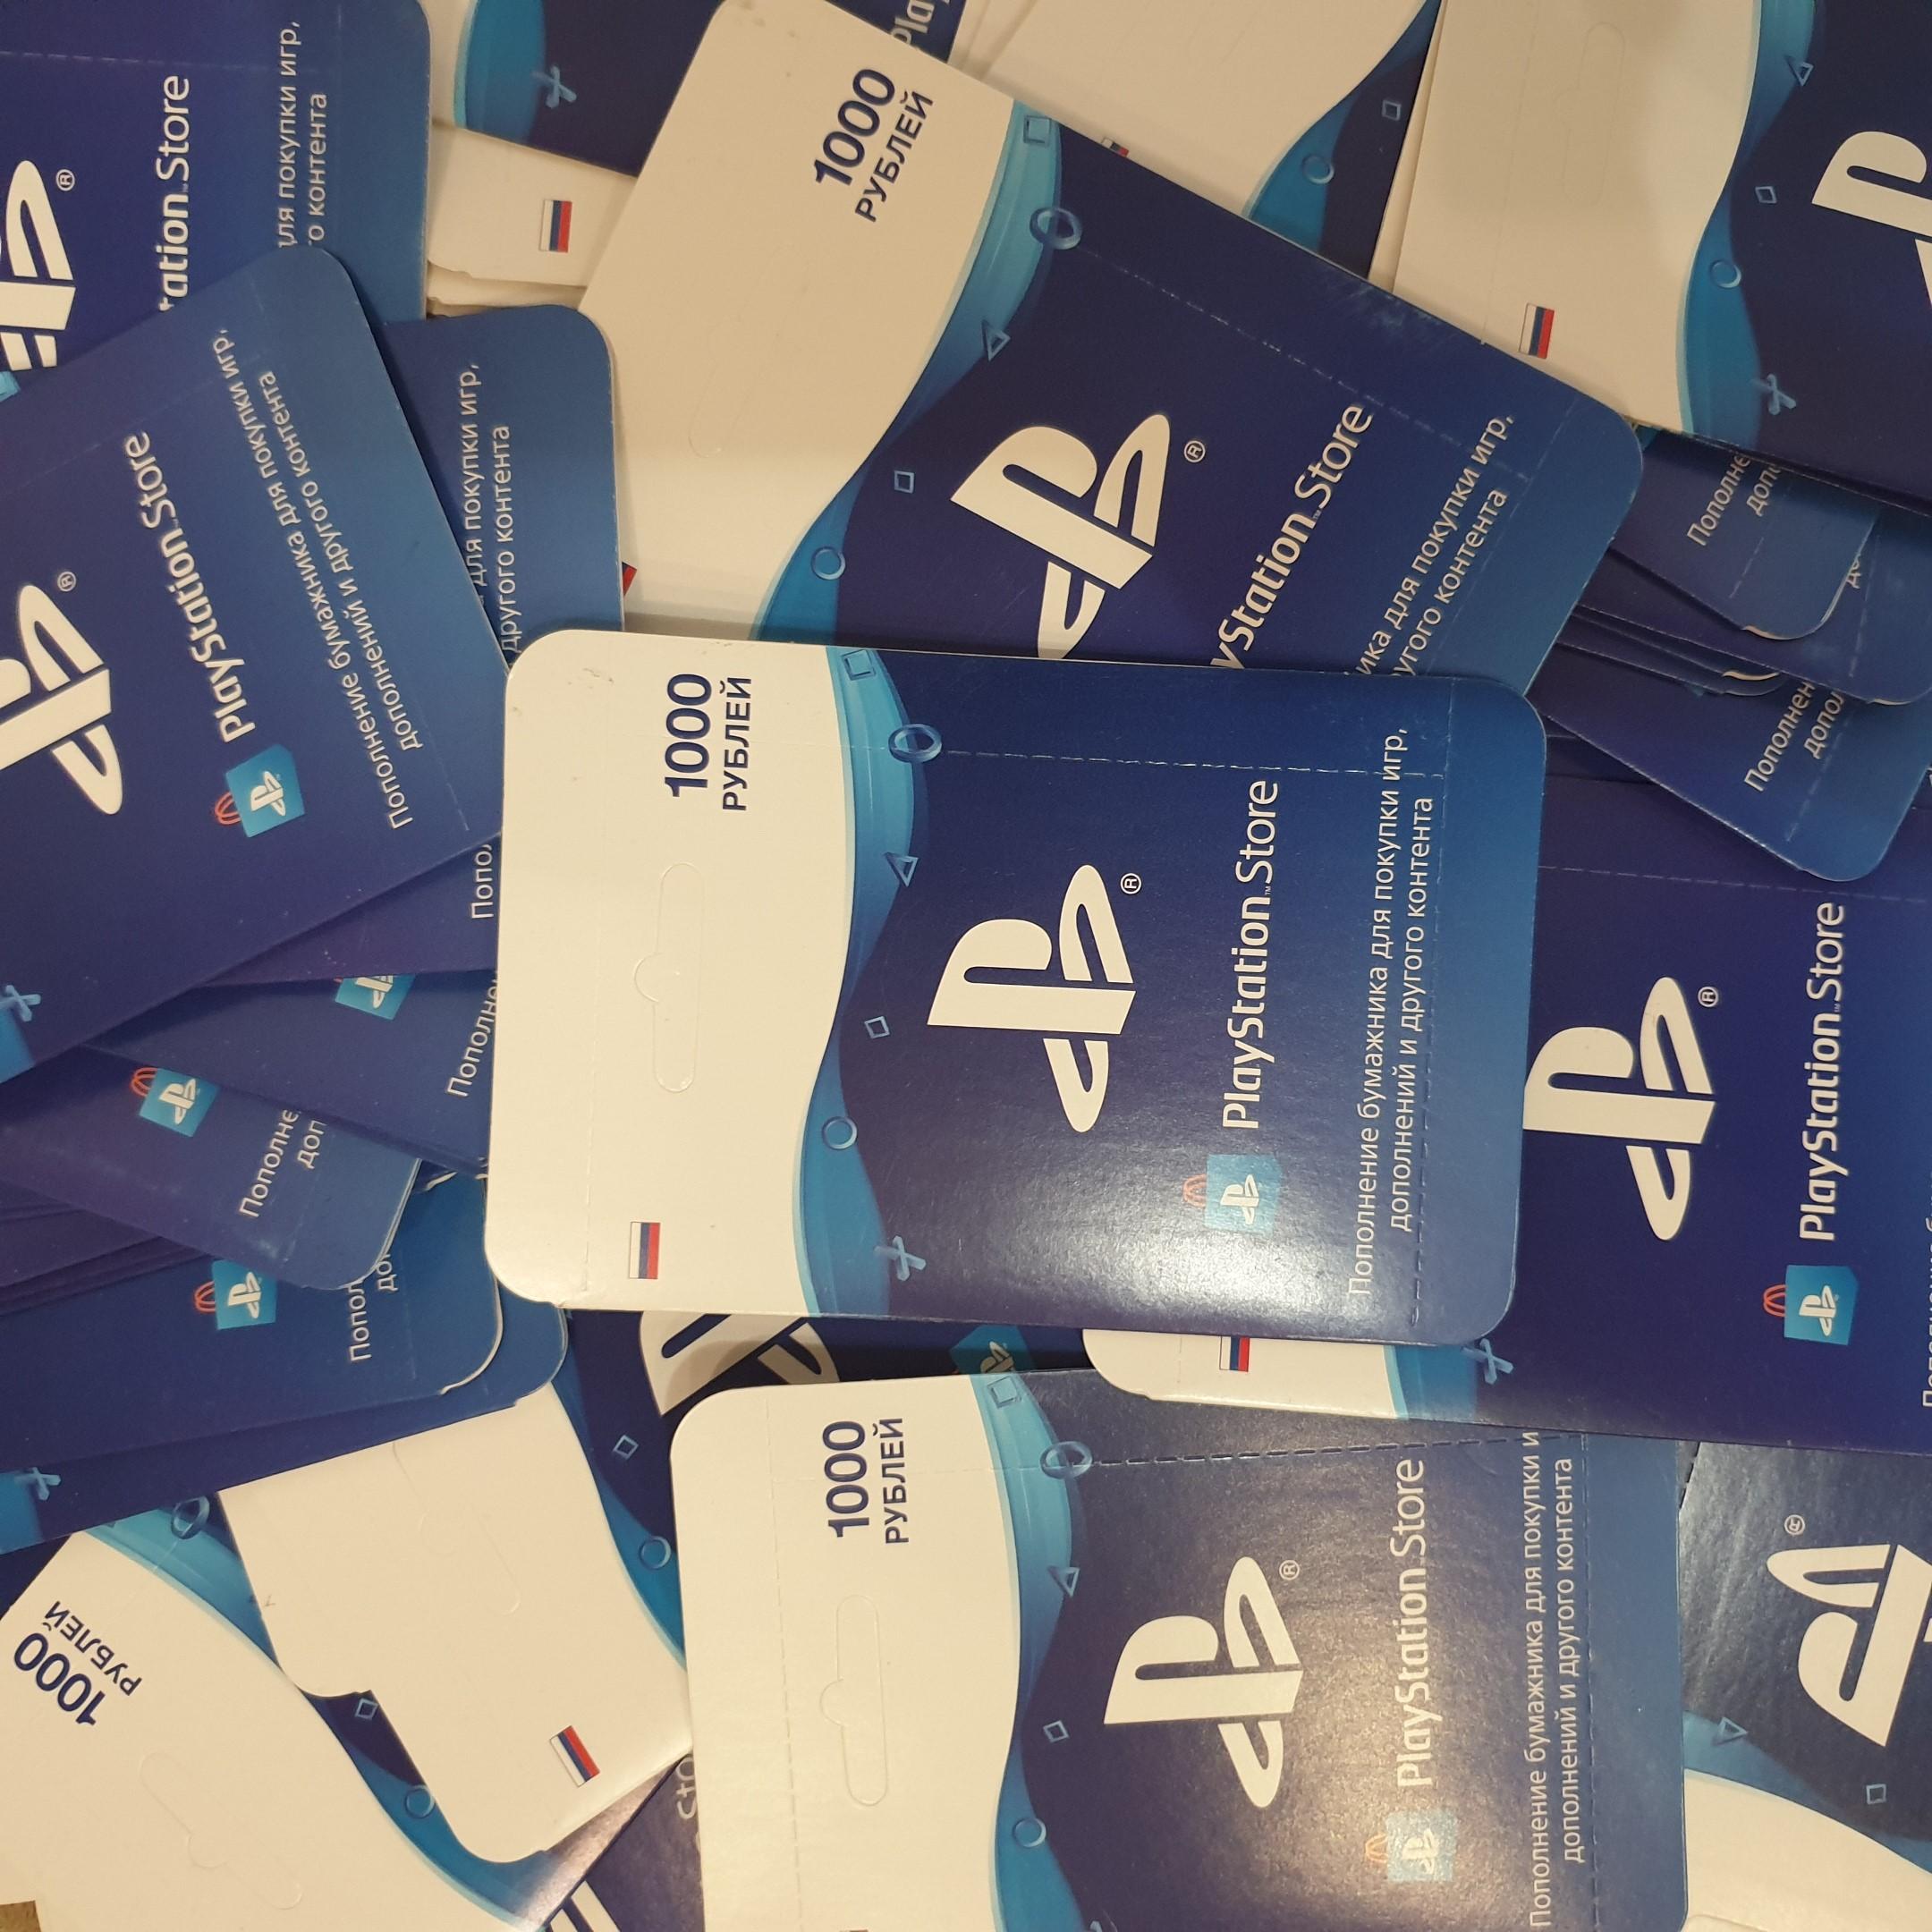 Payment card PSN 1000 rub / Playstation network 1000 ru 2019